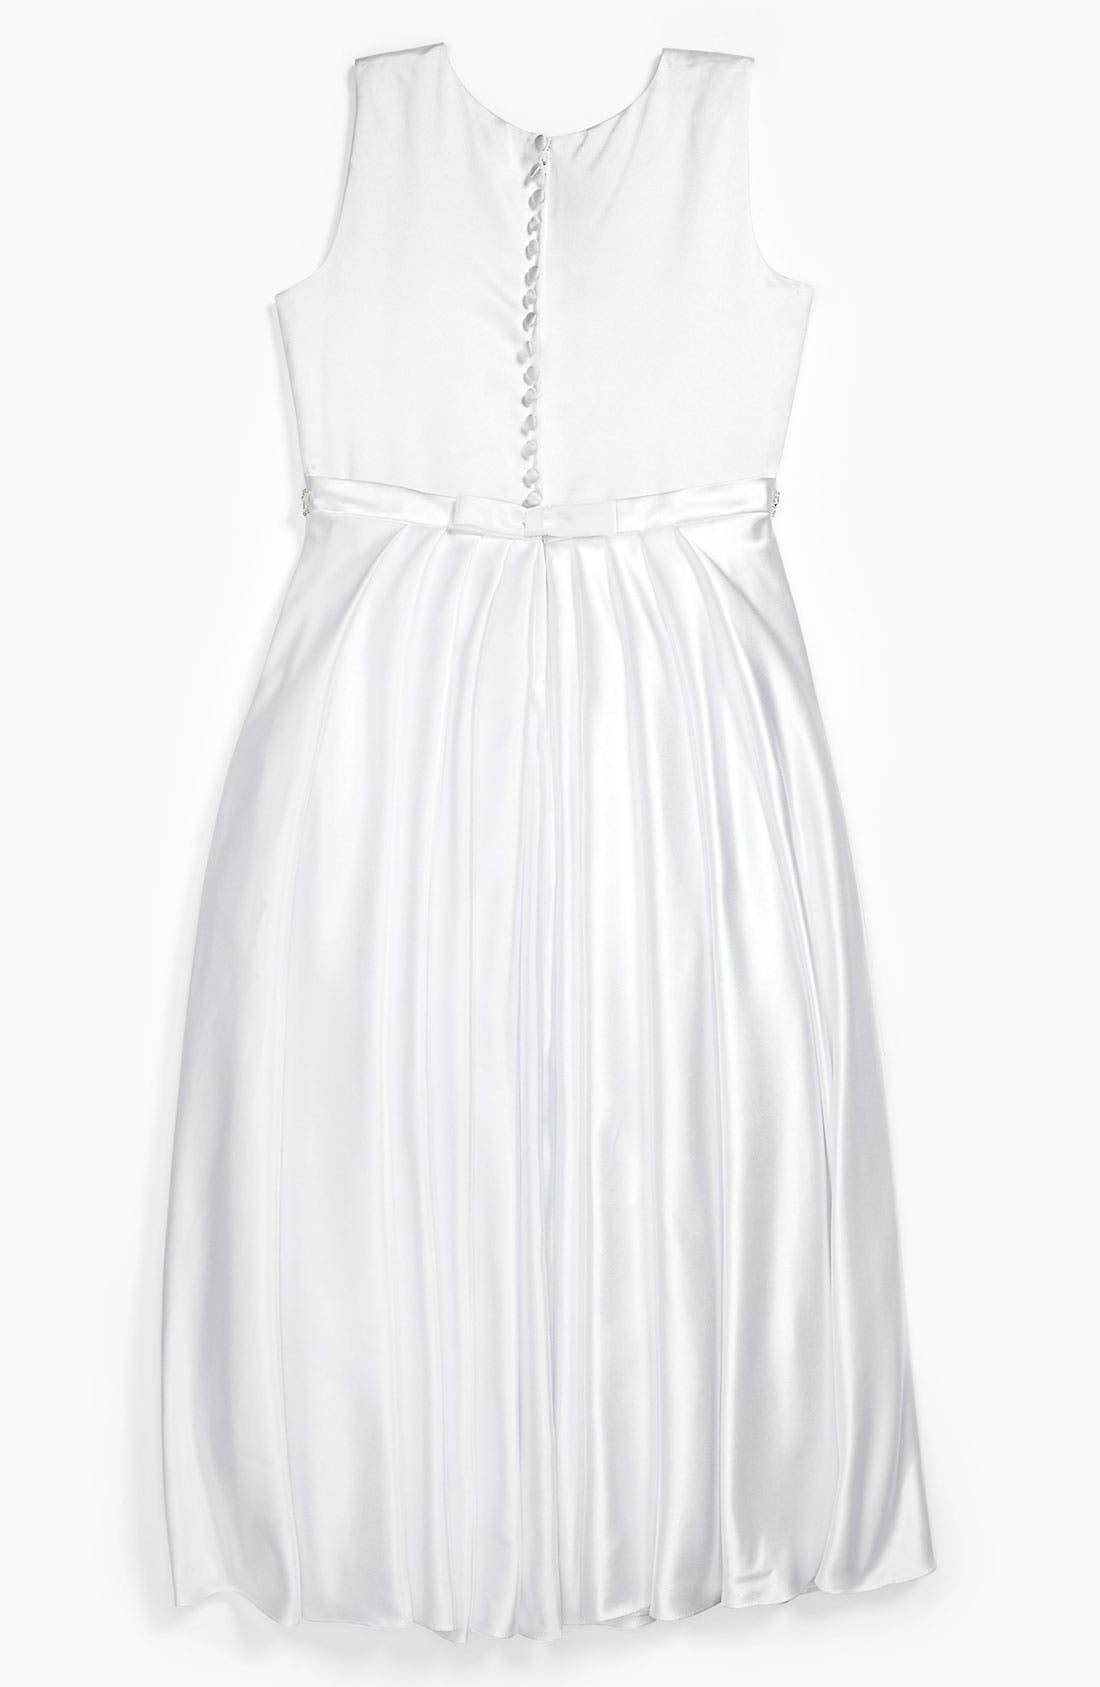 Alternate Image 3  - Joan Calabrese for Mon Cheri Jeweled Waist Dress (Little Girls & Big Girls)